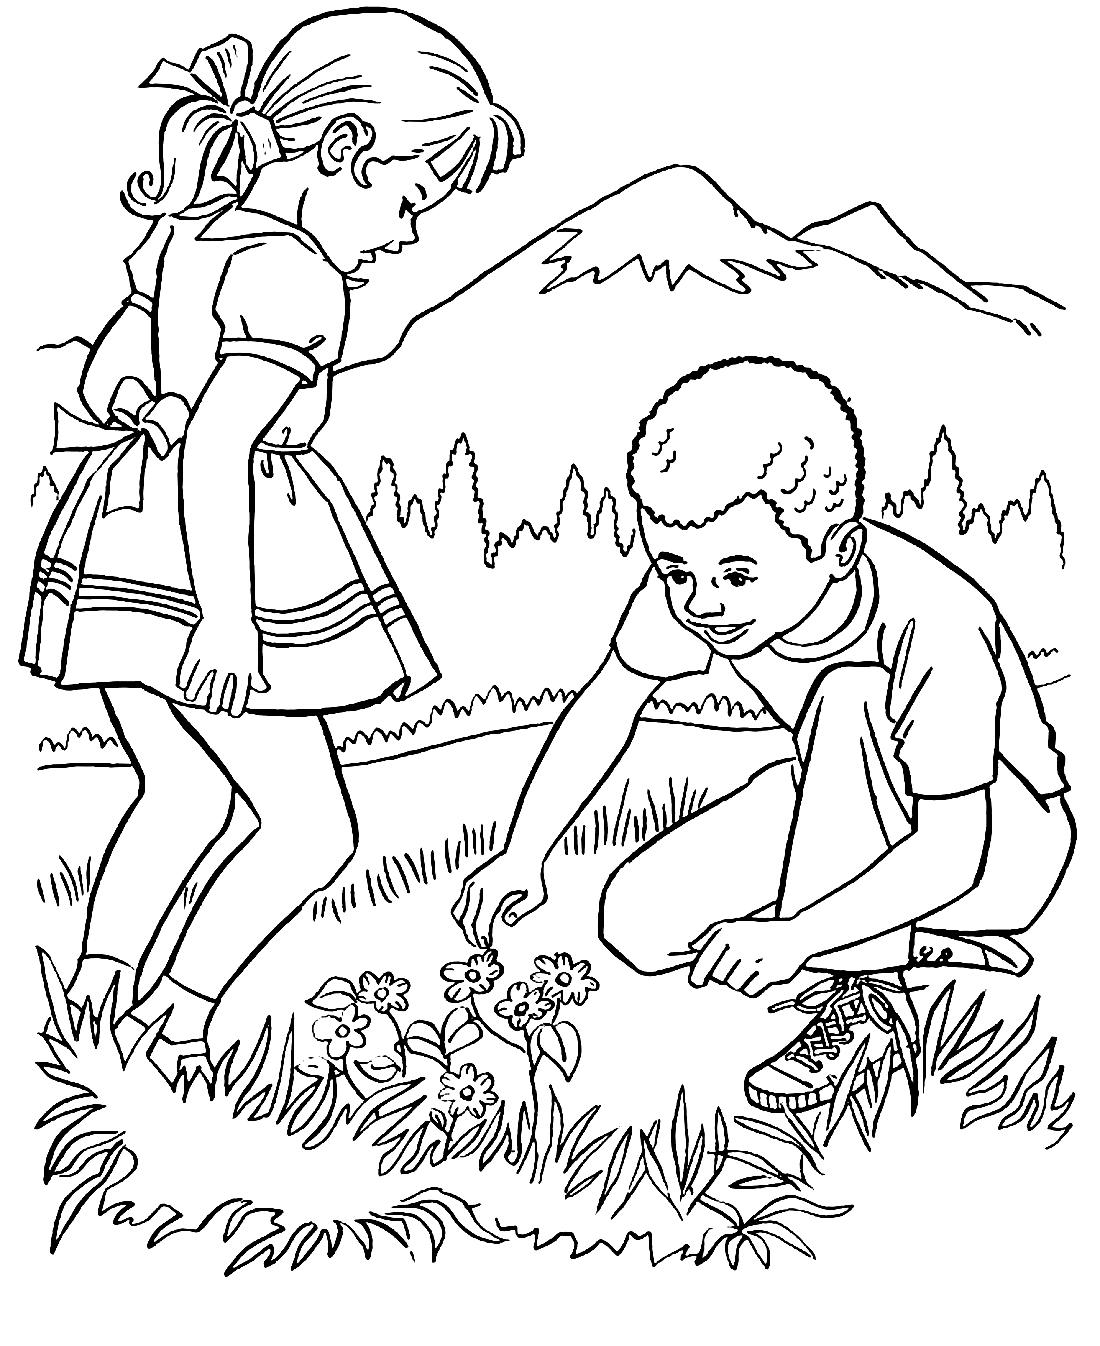 Раскраска на тему дети и природа